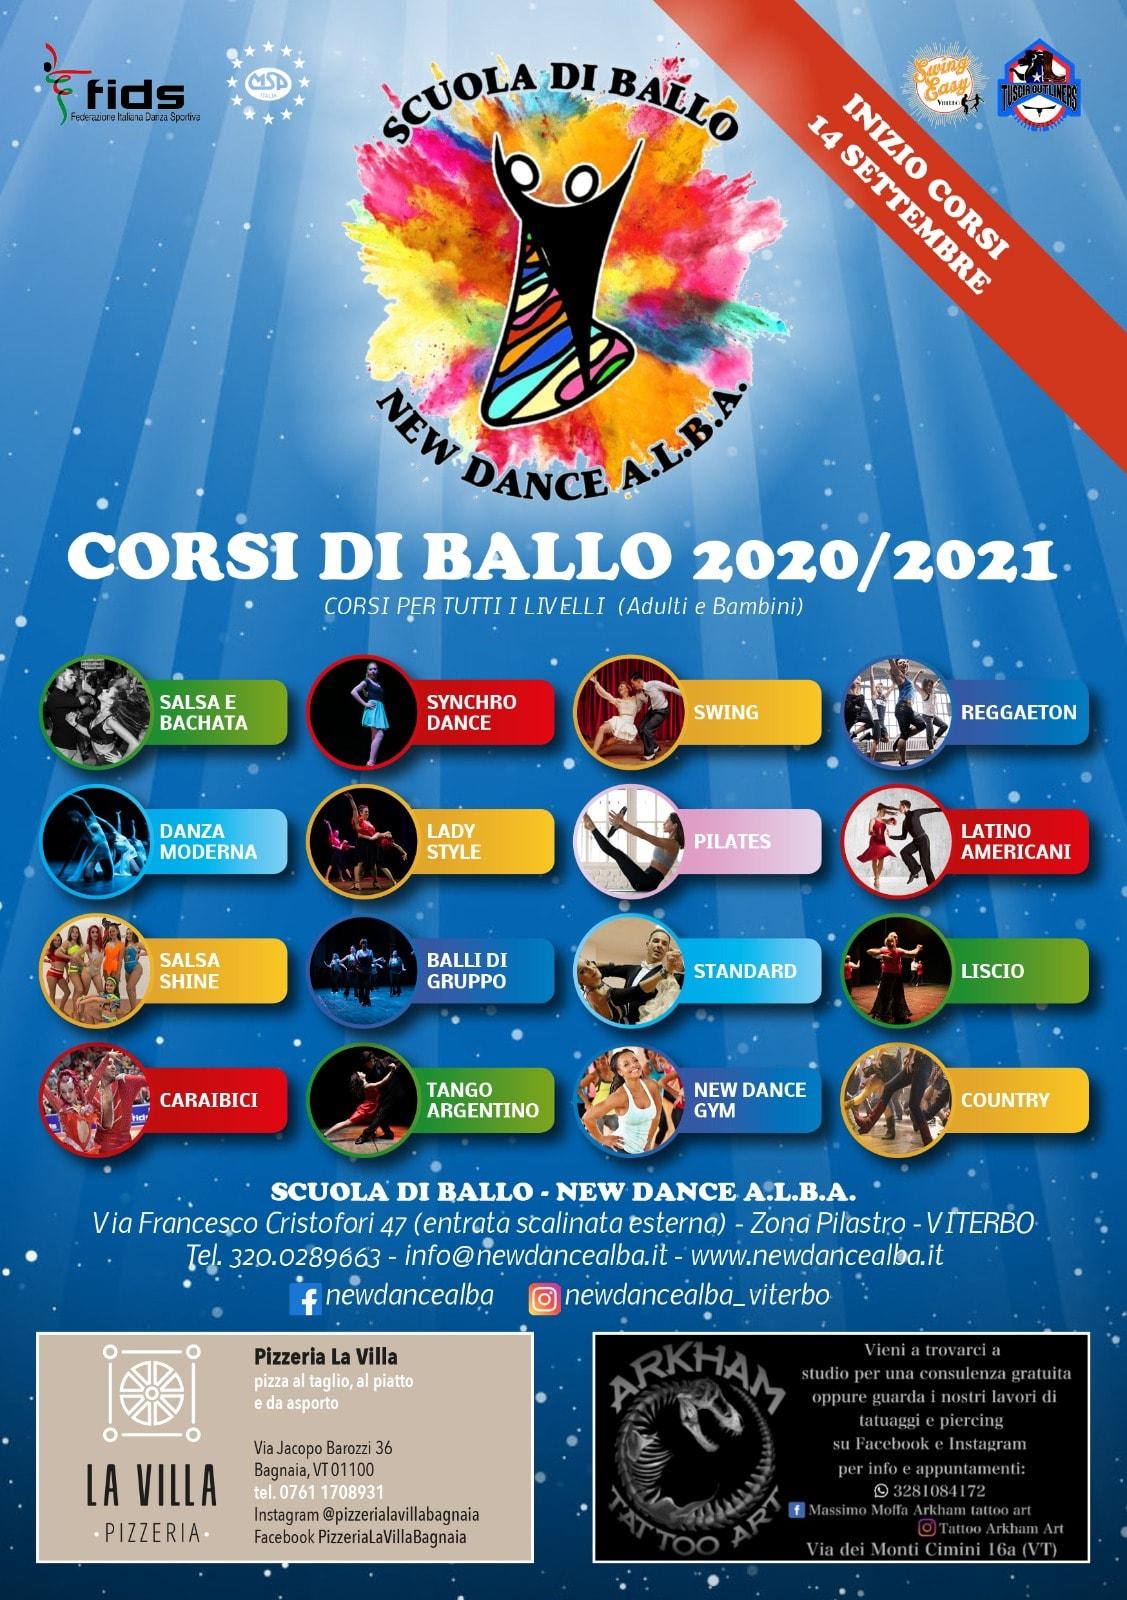 New Dance A.L.B.A. - Gianluca De Bianchi - Jeanzilla